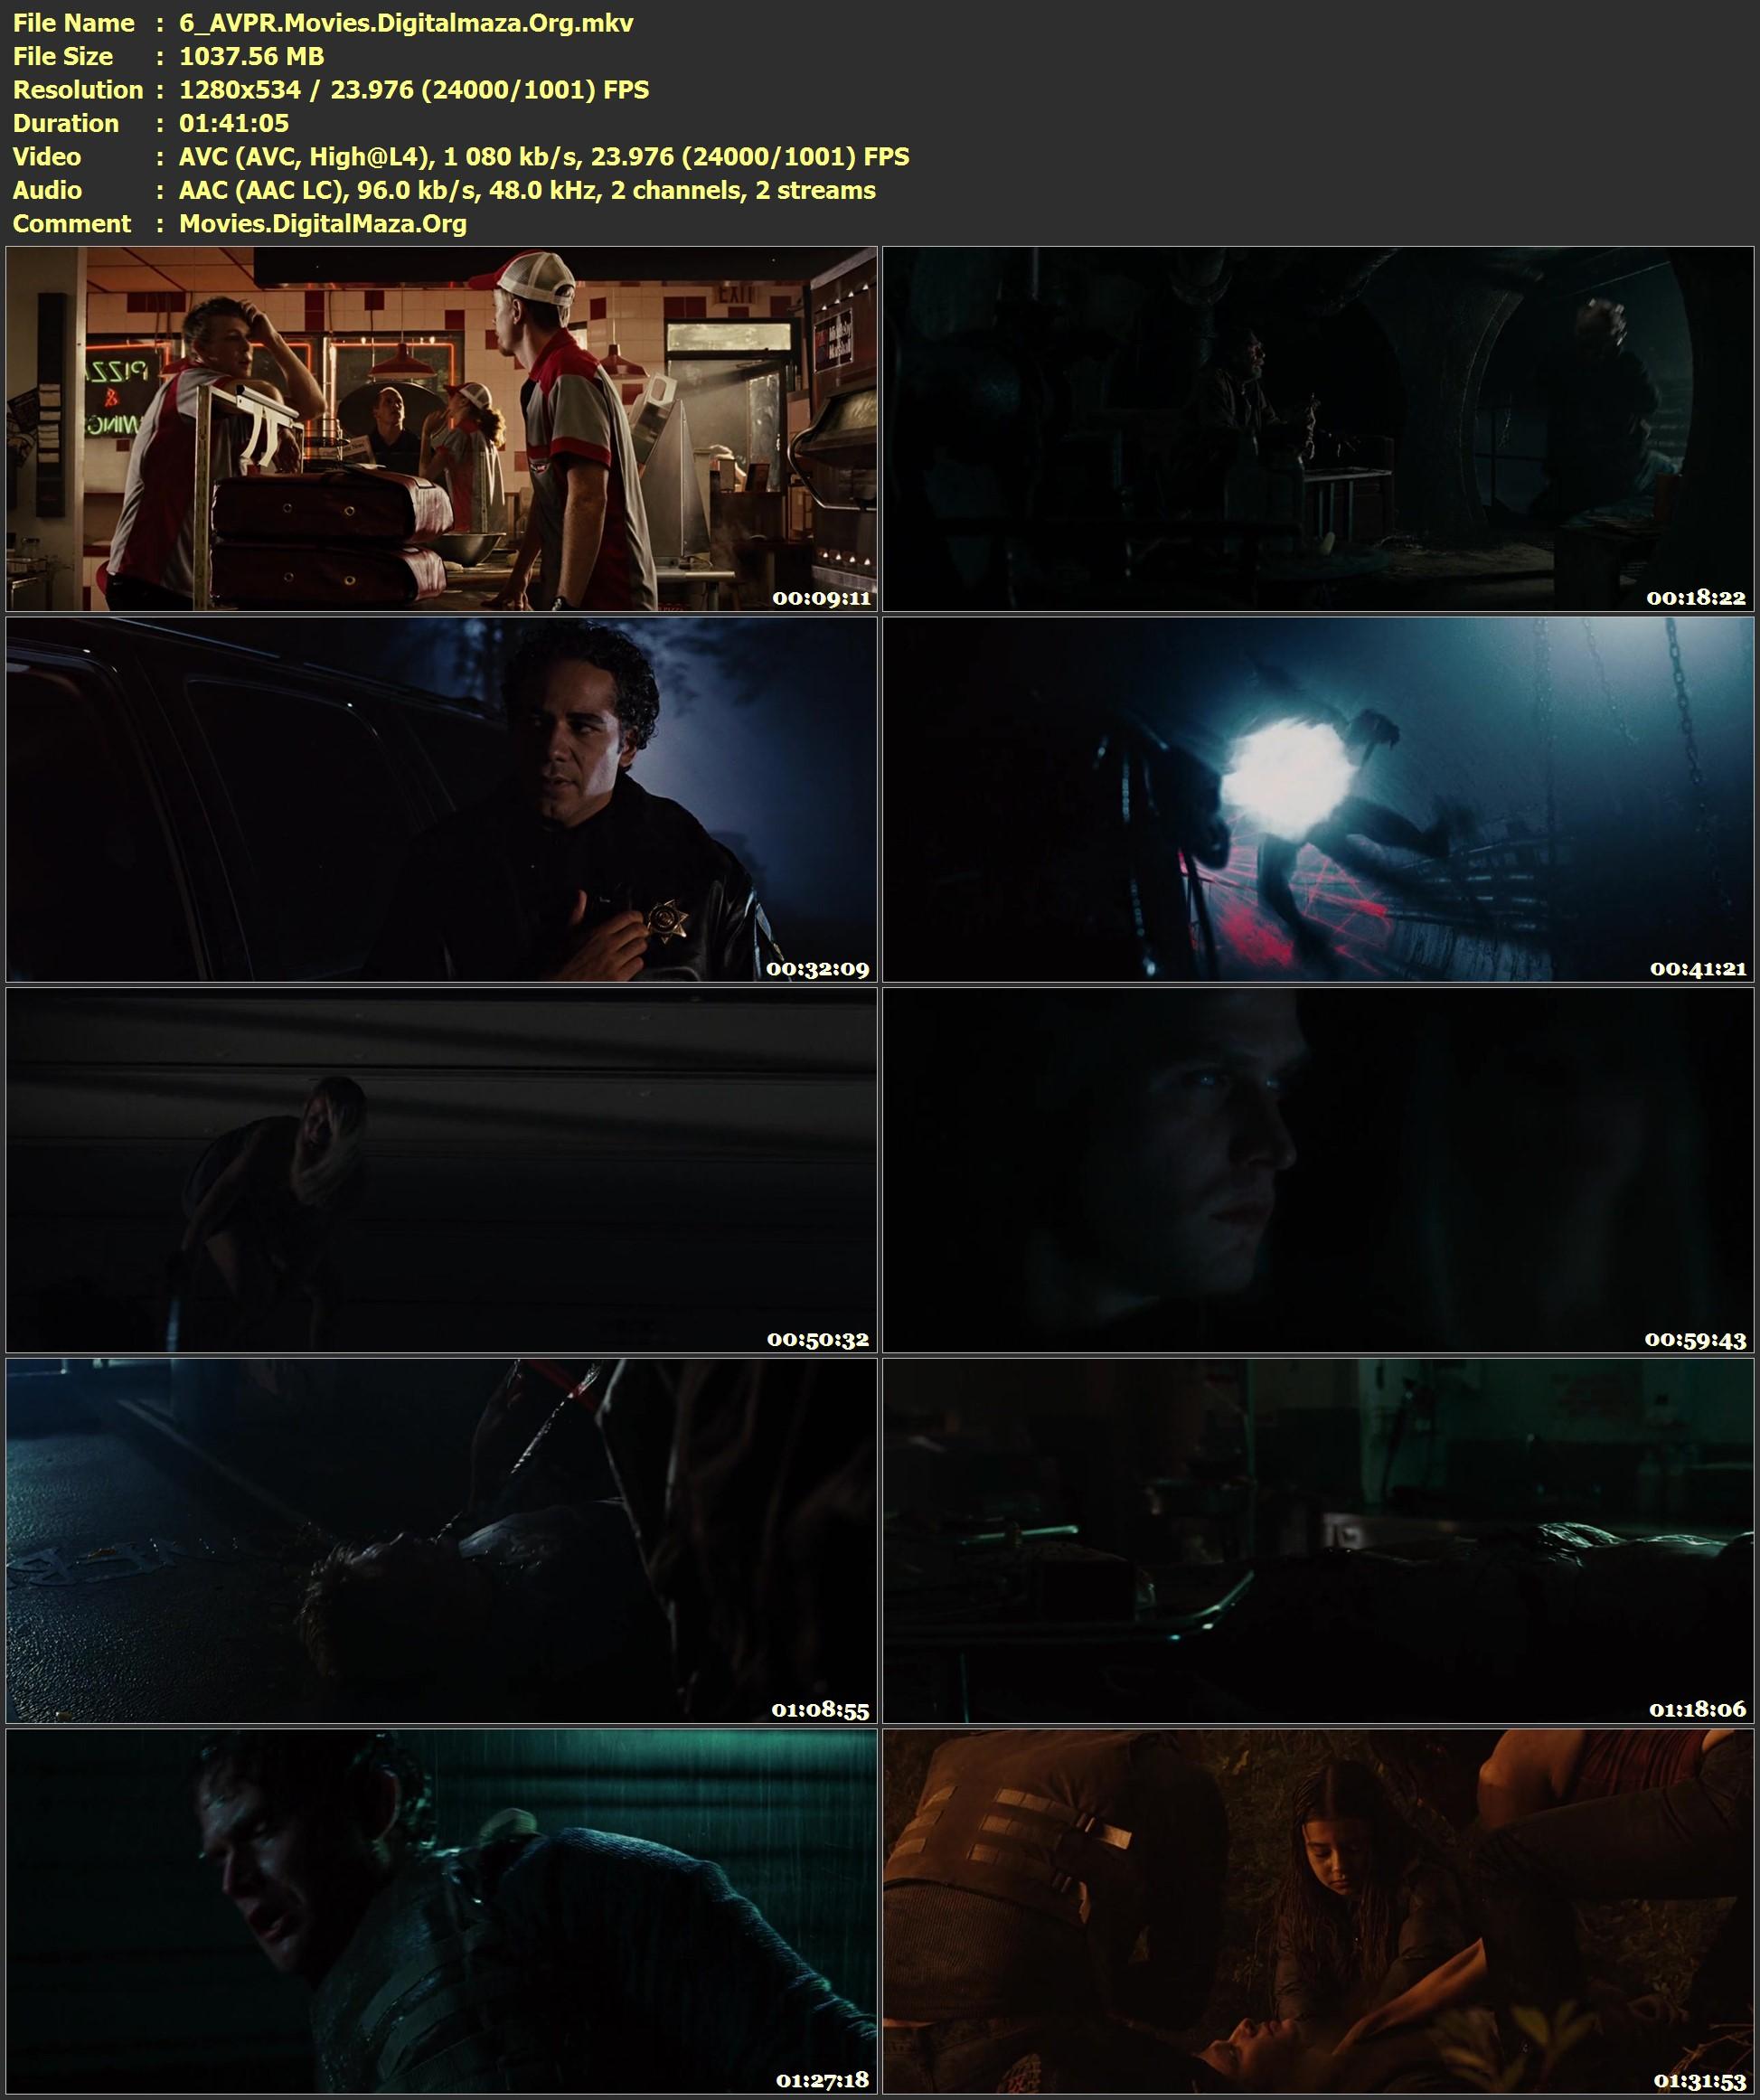 https://image.ibb.co/en7jTH/6_AVPR_Movies_Digitalmaza_Org_mkv.jpg